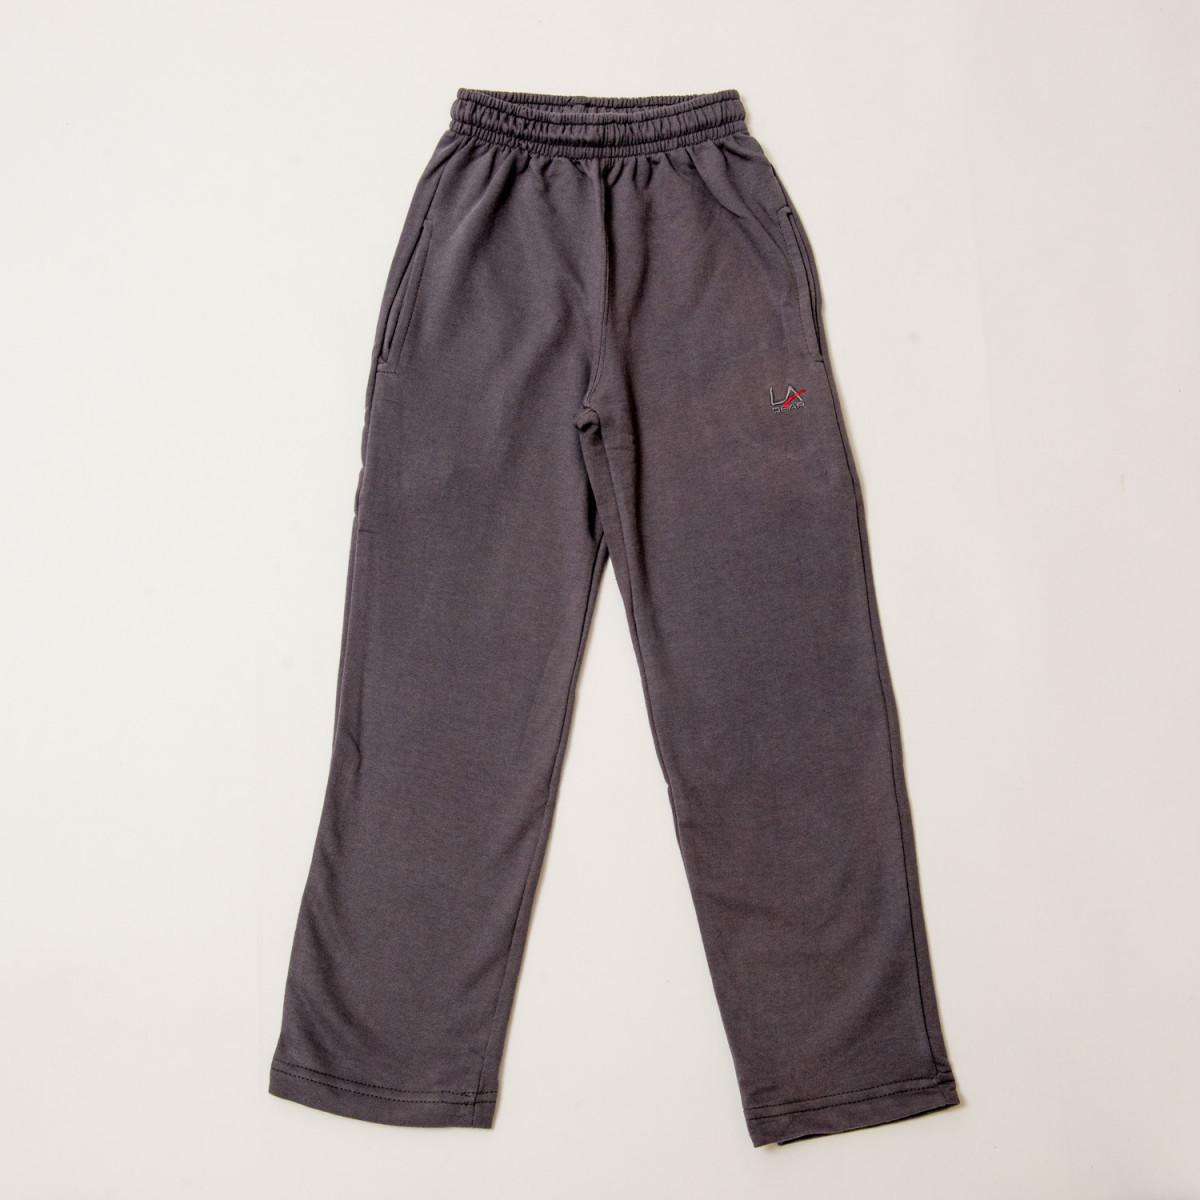 Pantalón La Gear Algodón Rústico Niño